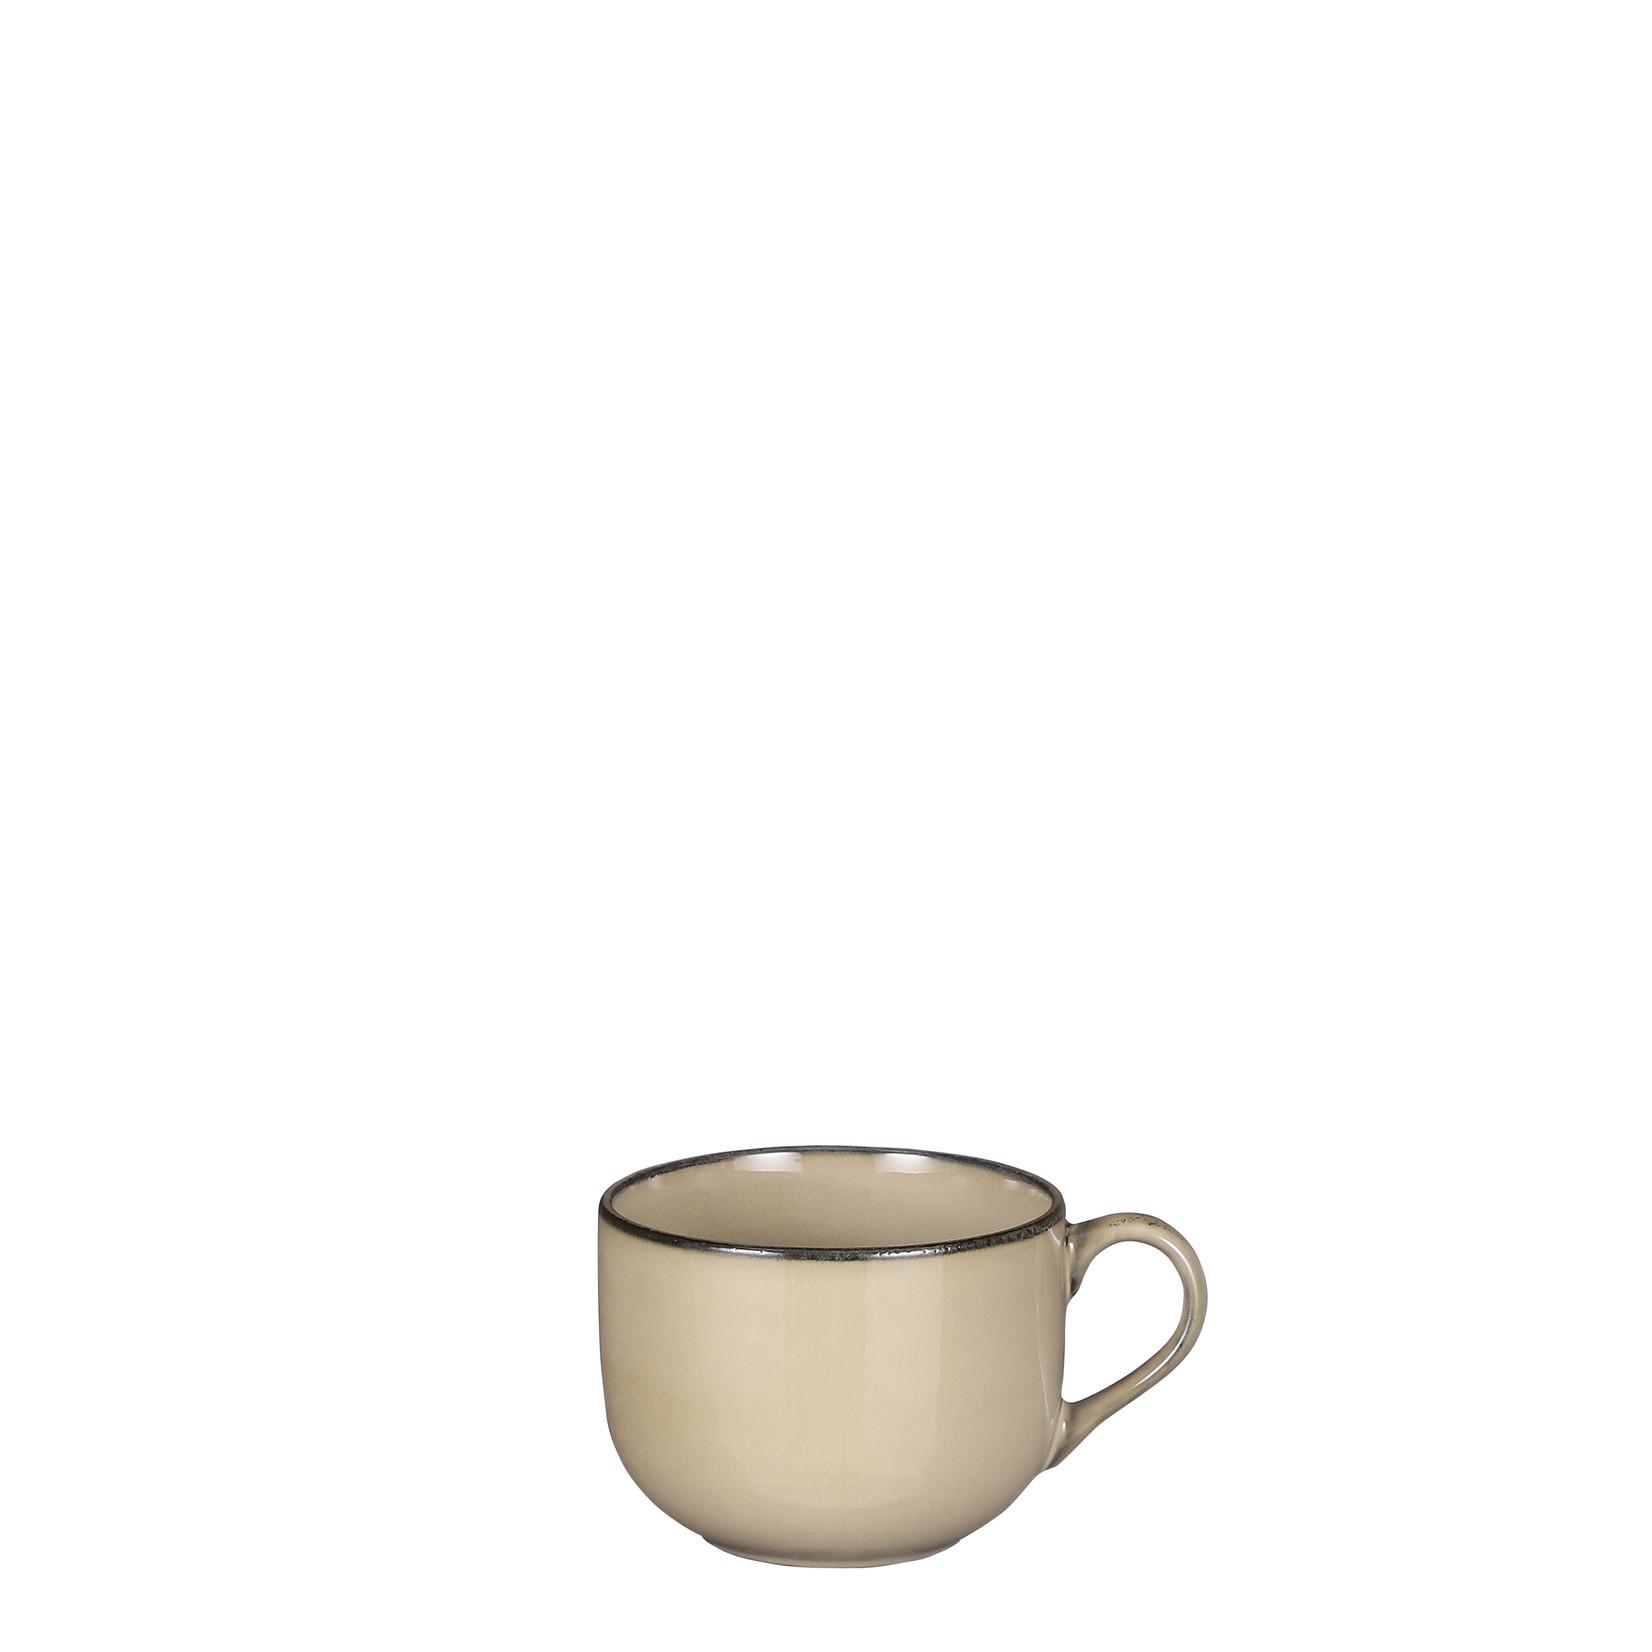 MiCa Tabo mug cream